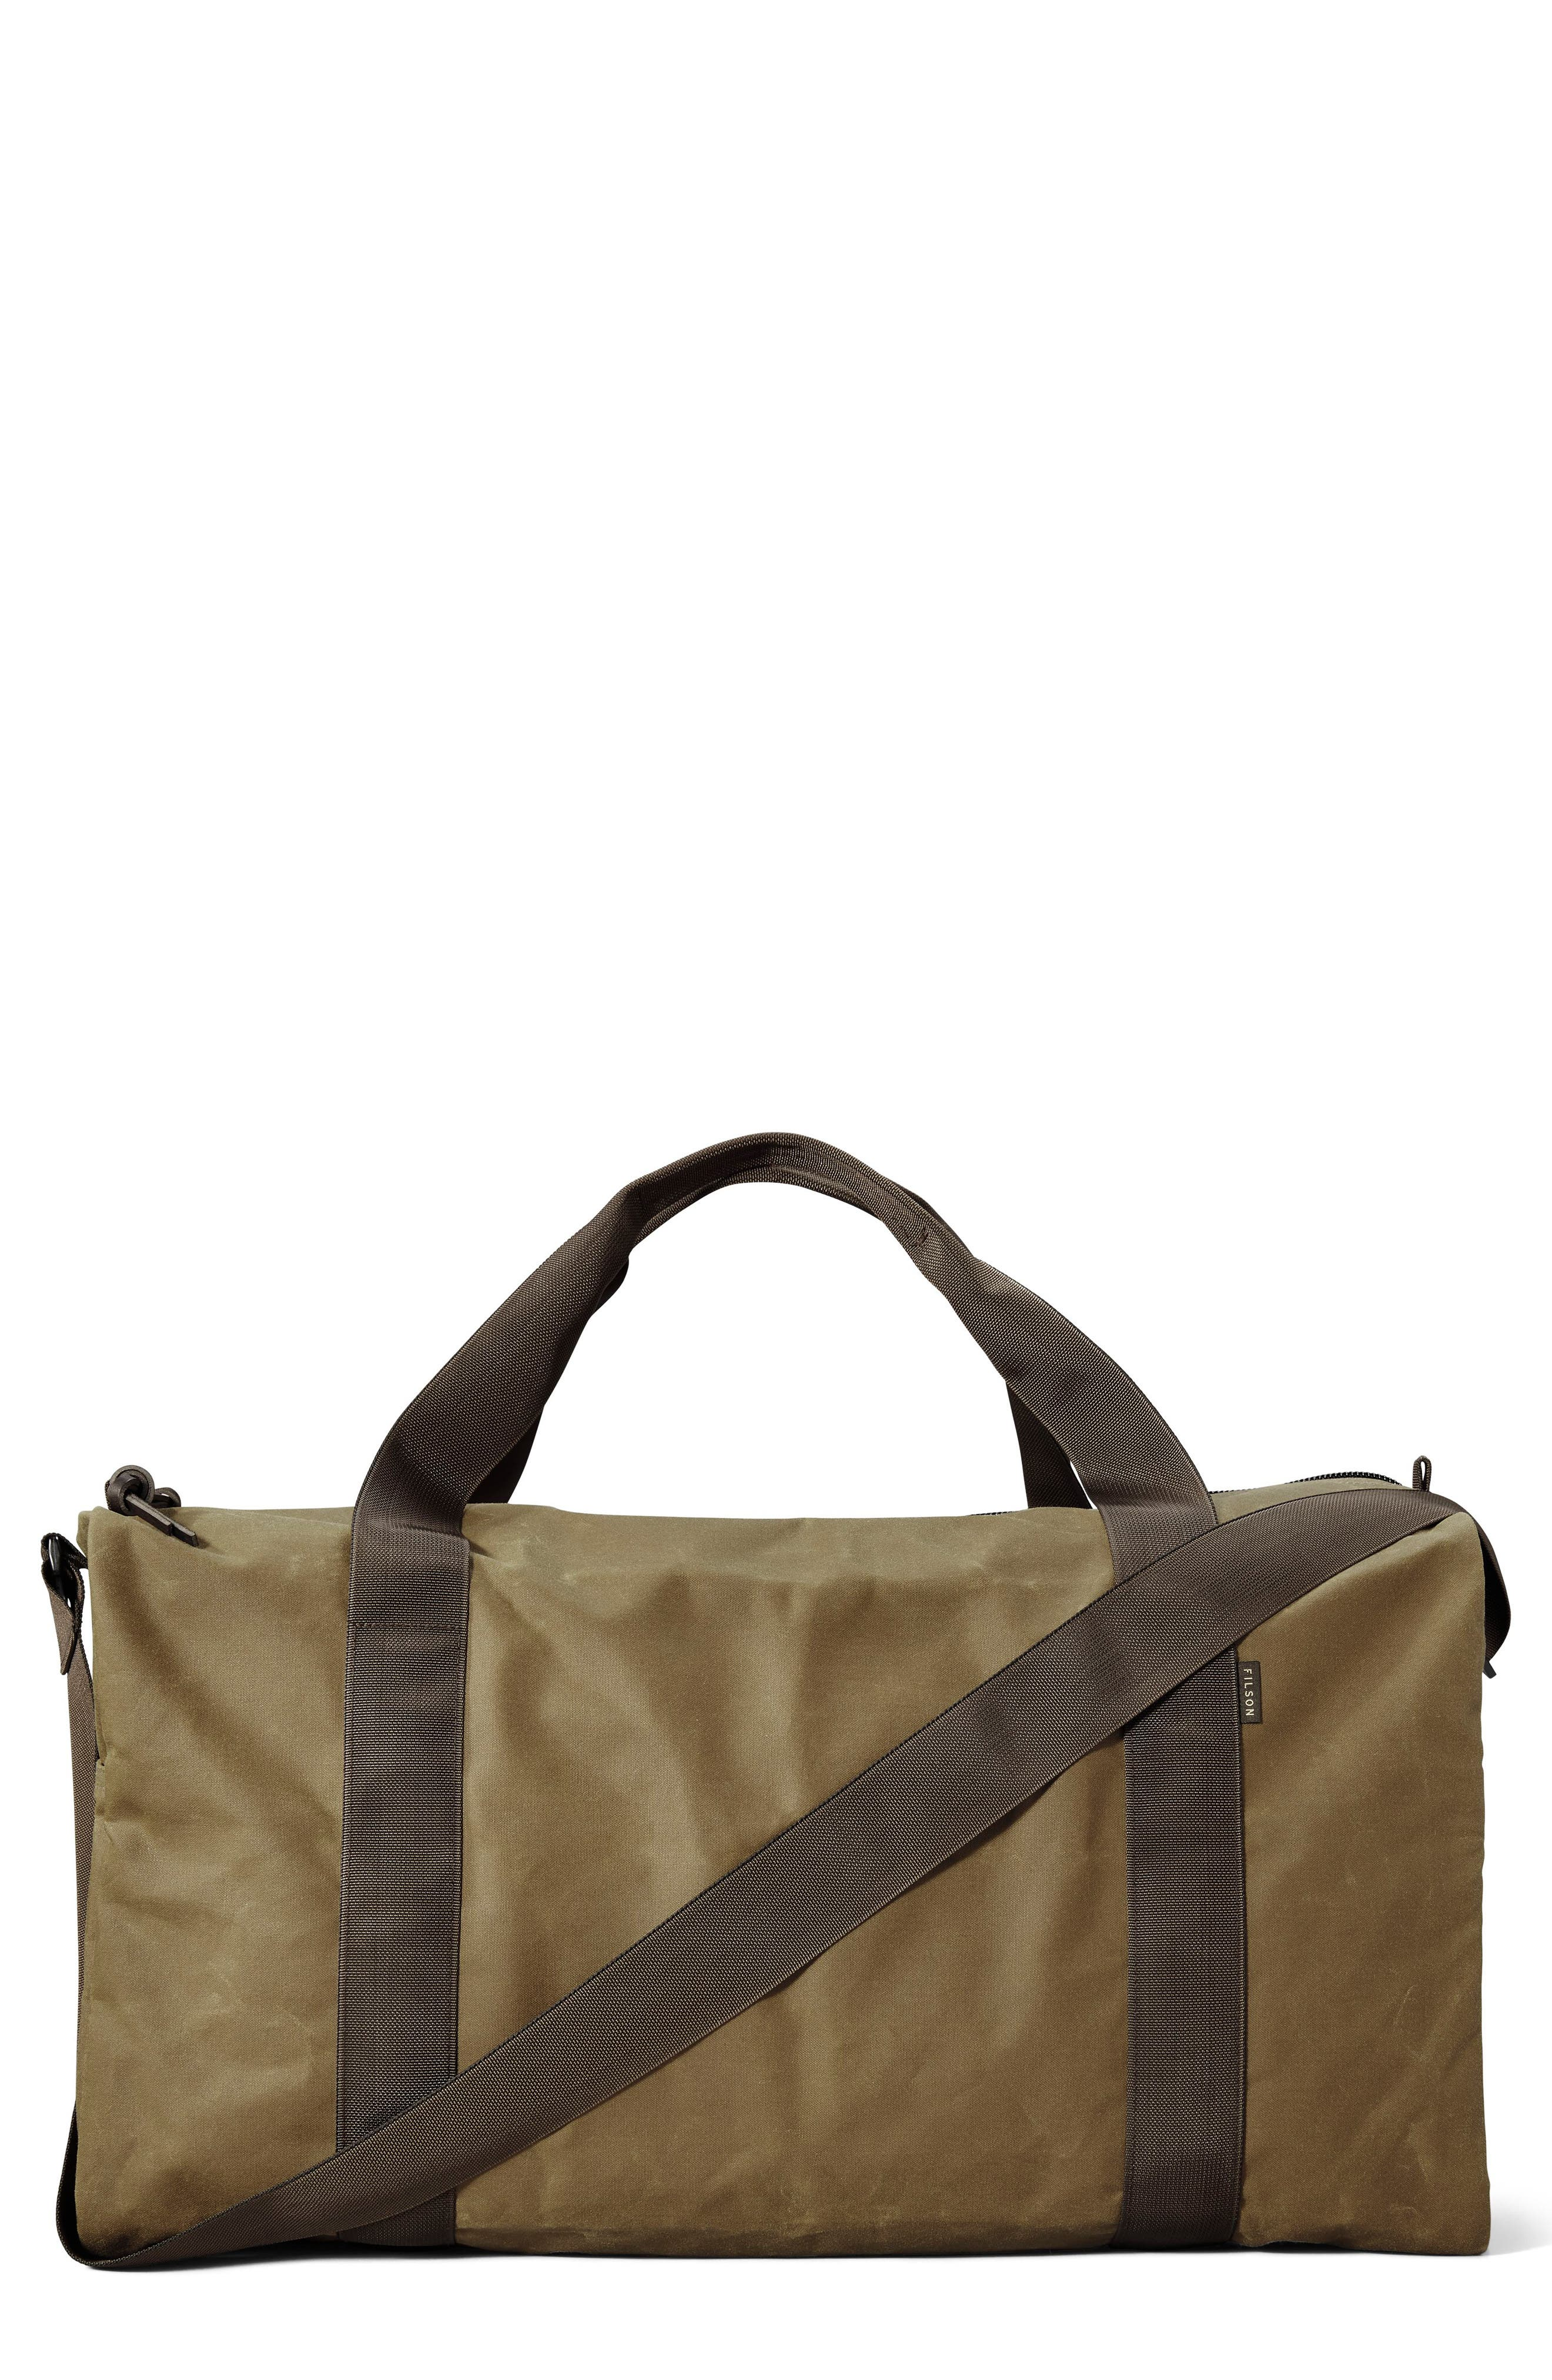 Filson Medium Field Duffel Bag